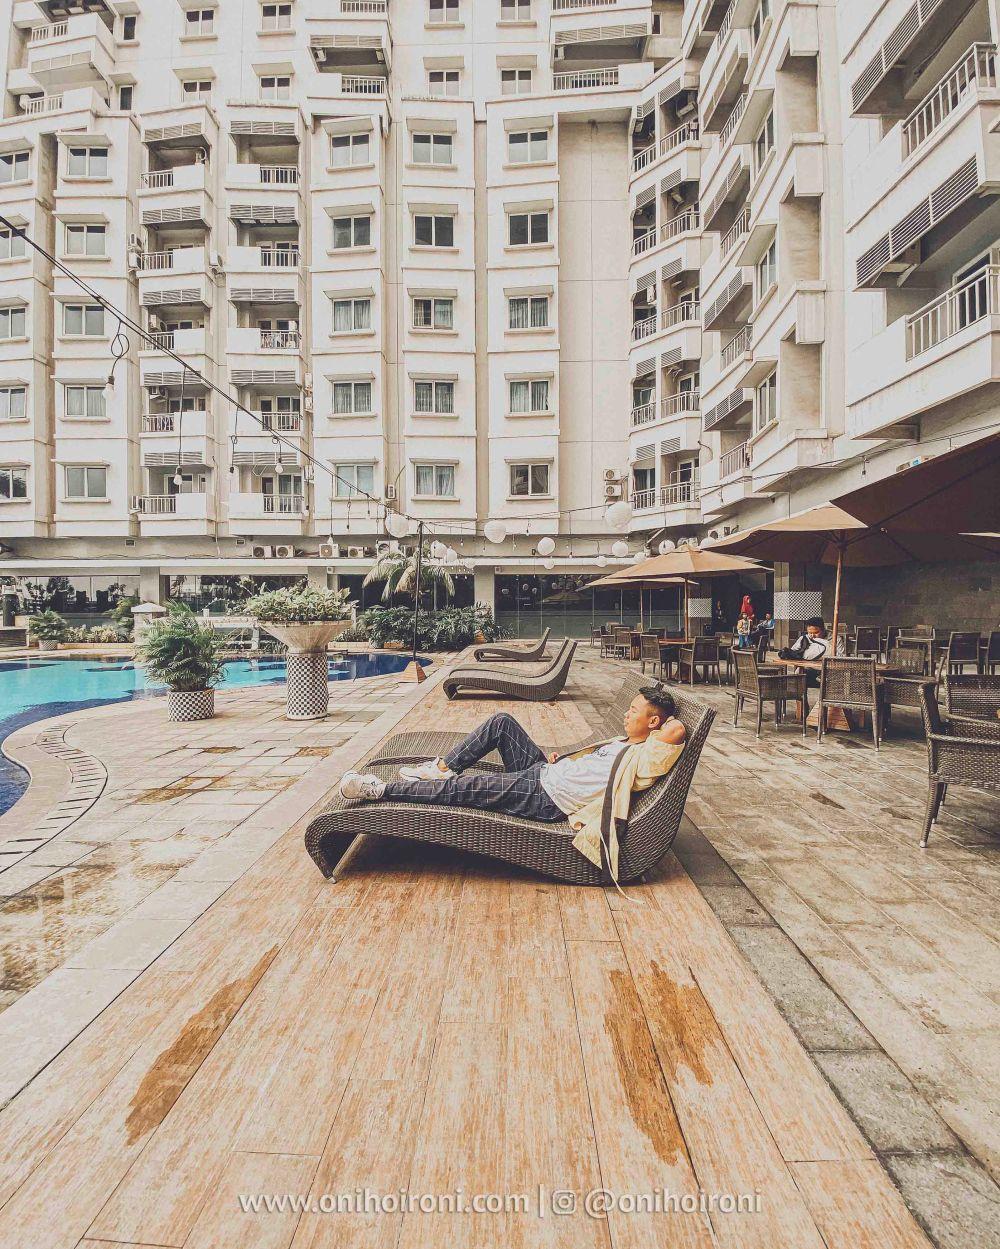 6Restaurant Review Hotel Grand Whiz Poins Simatupang Jakarta oni hoironi.jpg